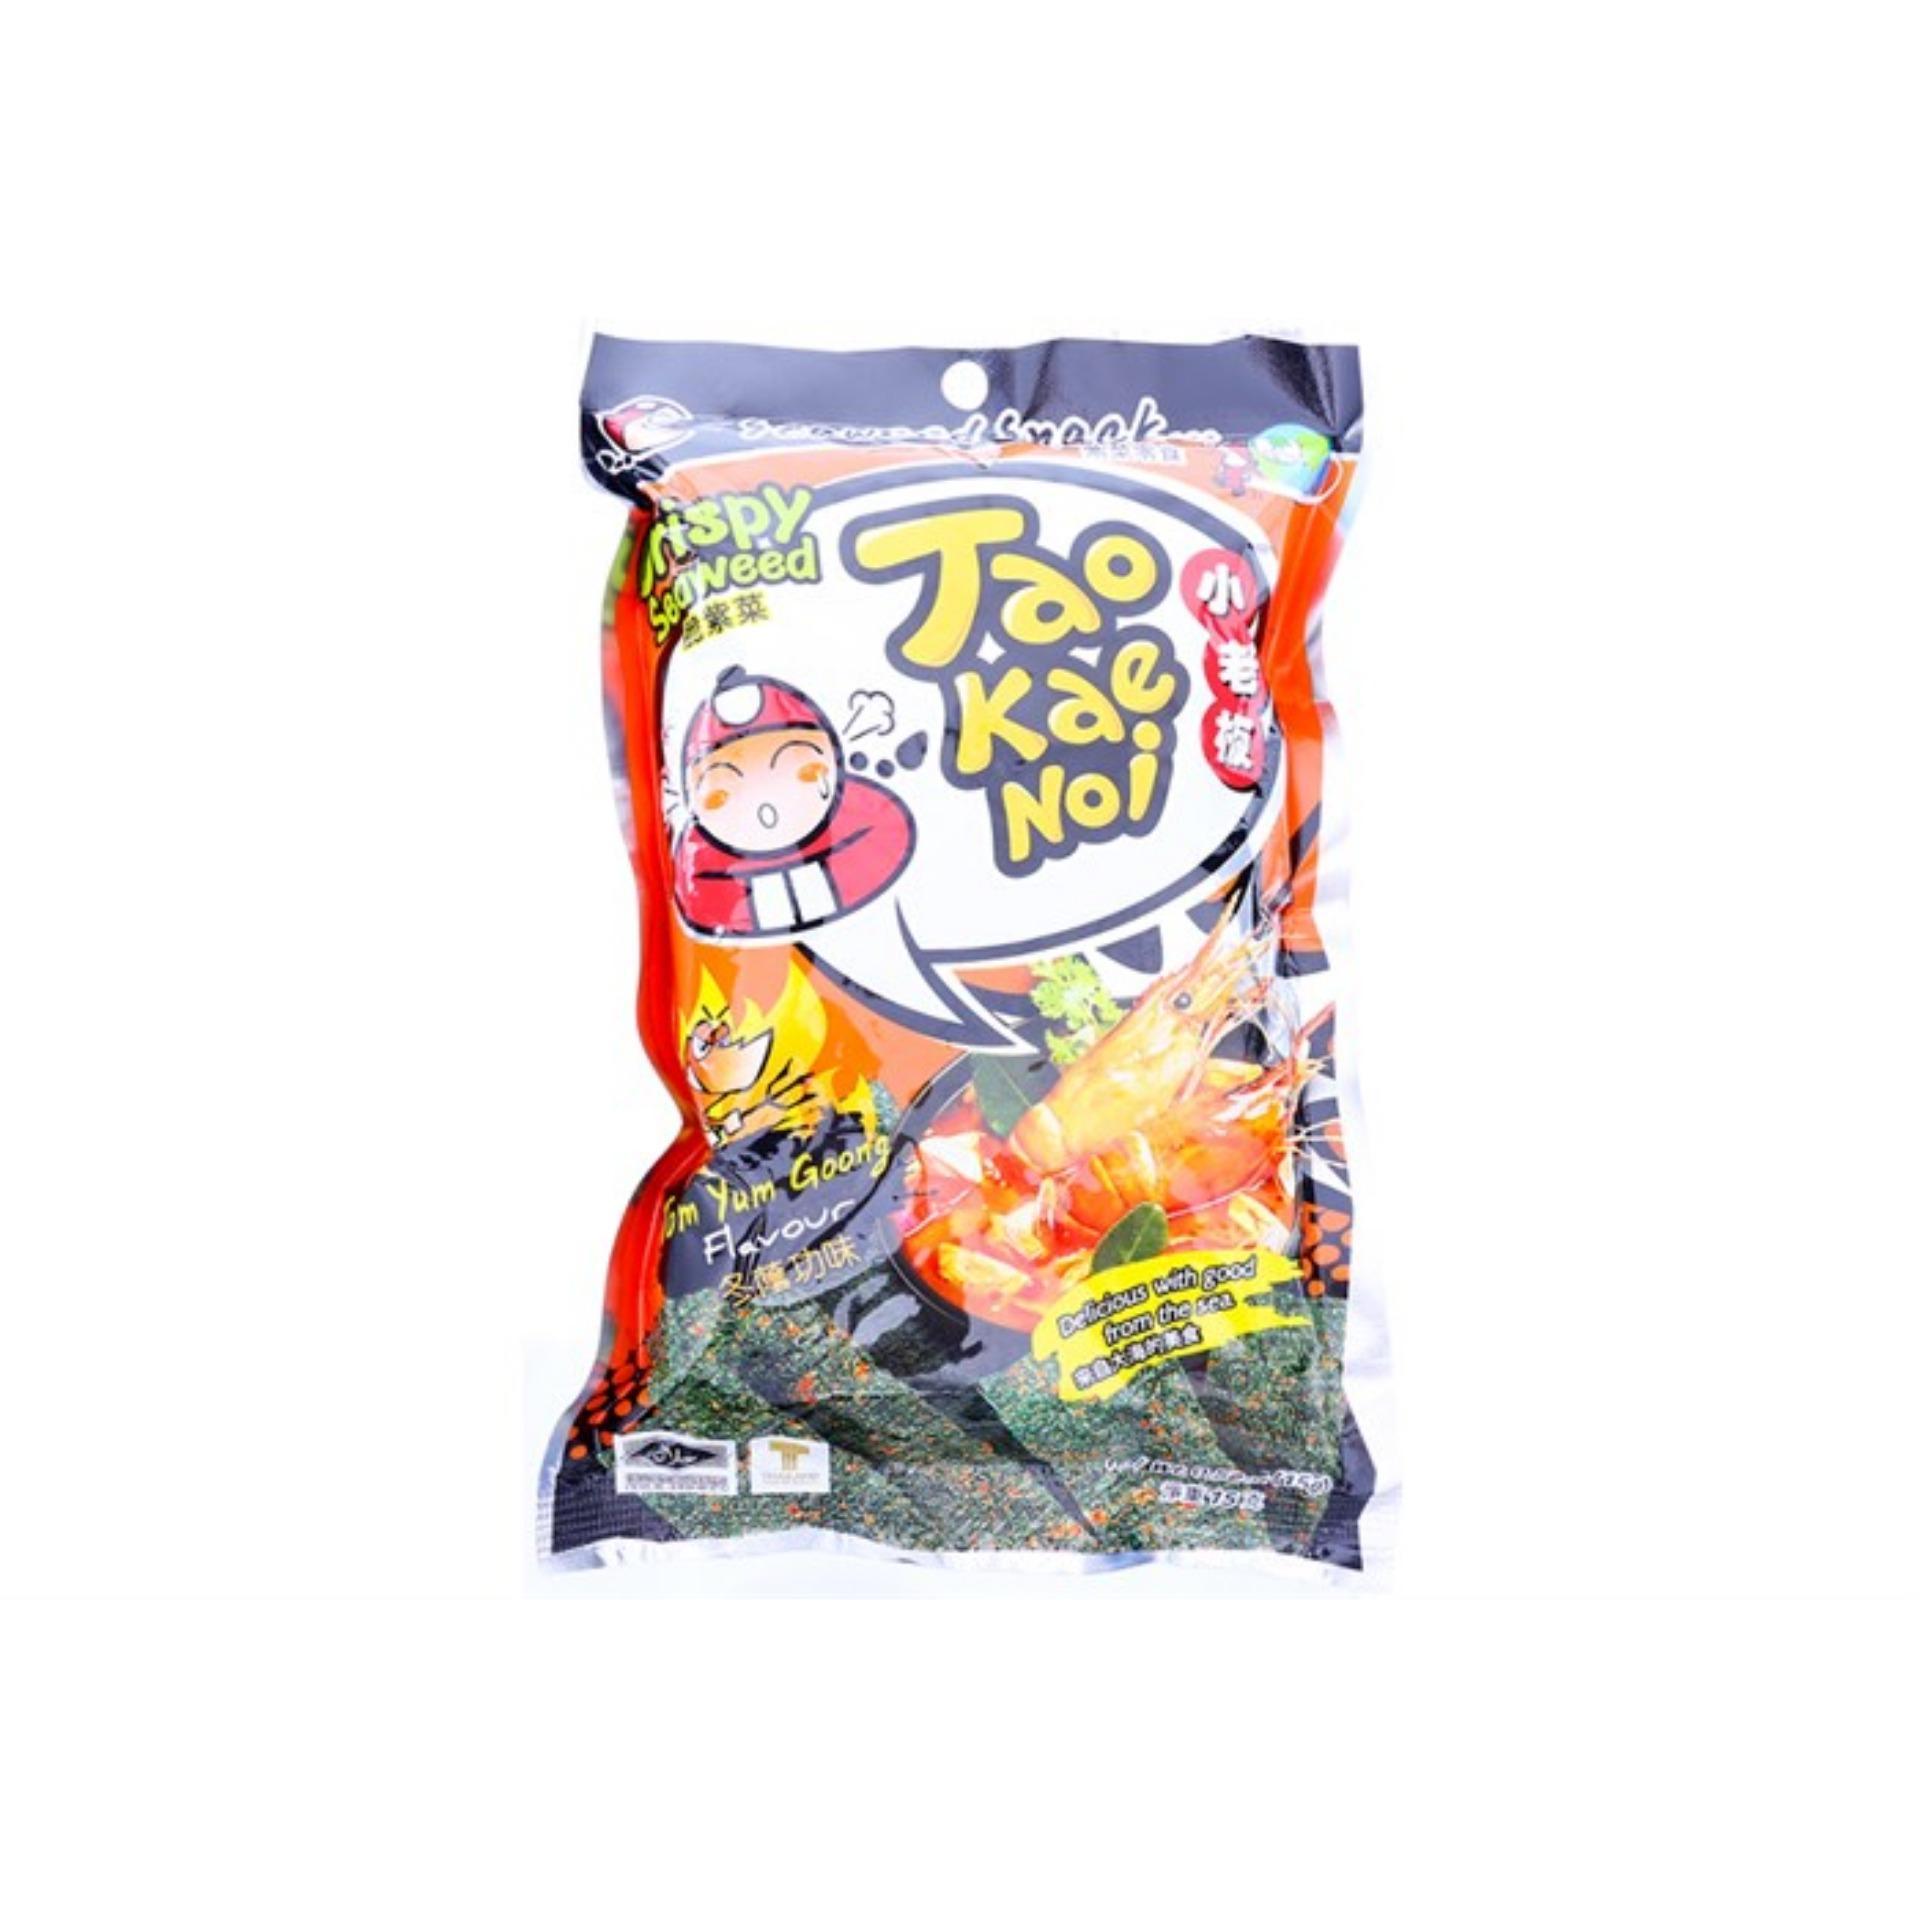 Snack Rong biển Taokaenoi Sấy Crispy Seaweed vị Chua cay 15g